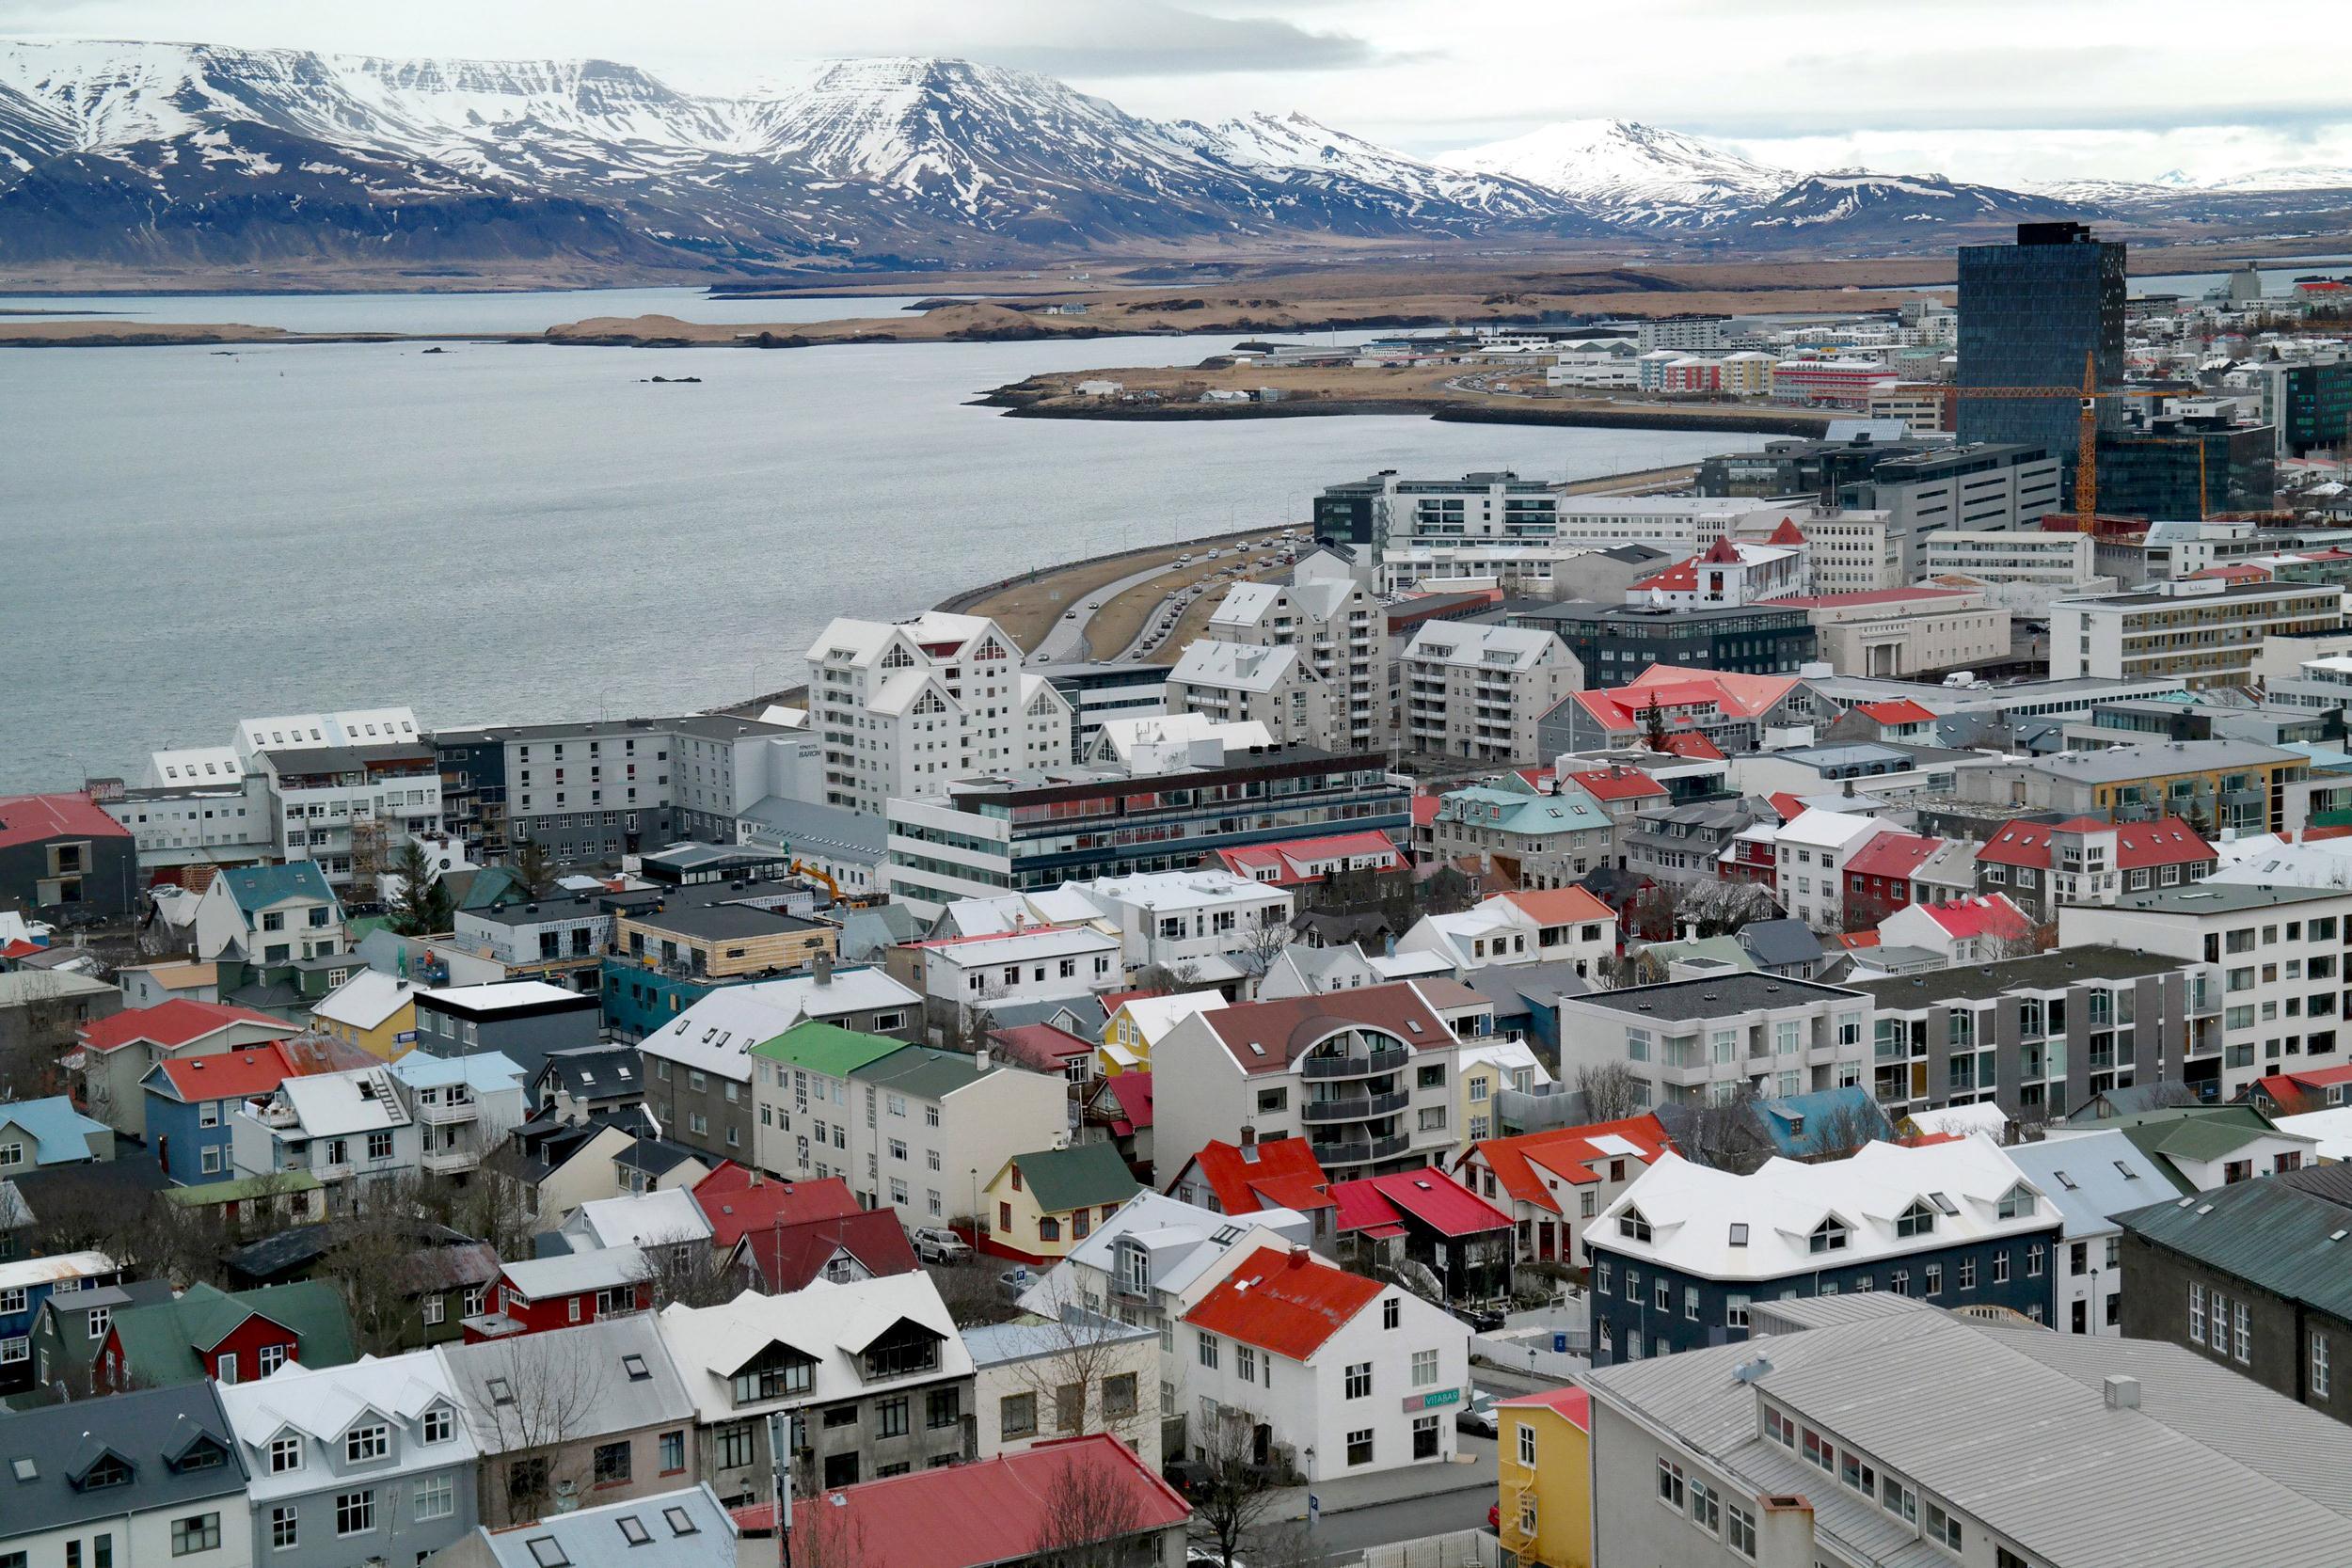 Image: Daily Life In Reykjavik